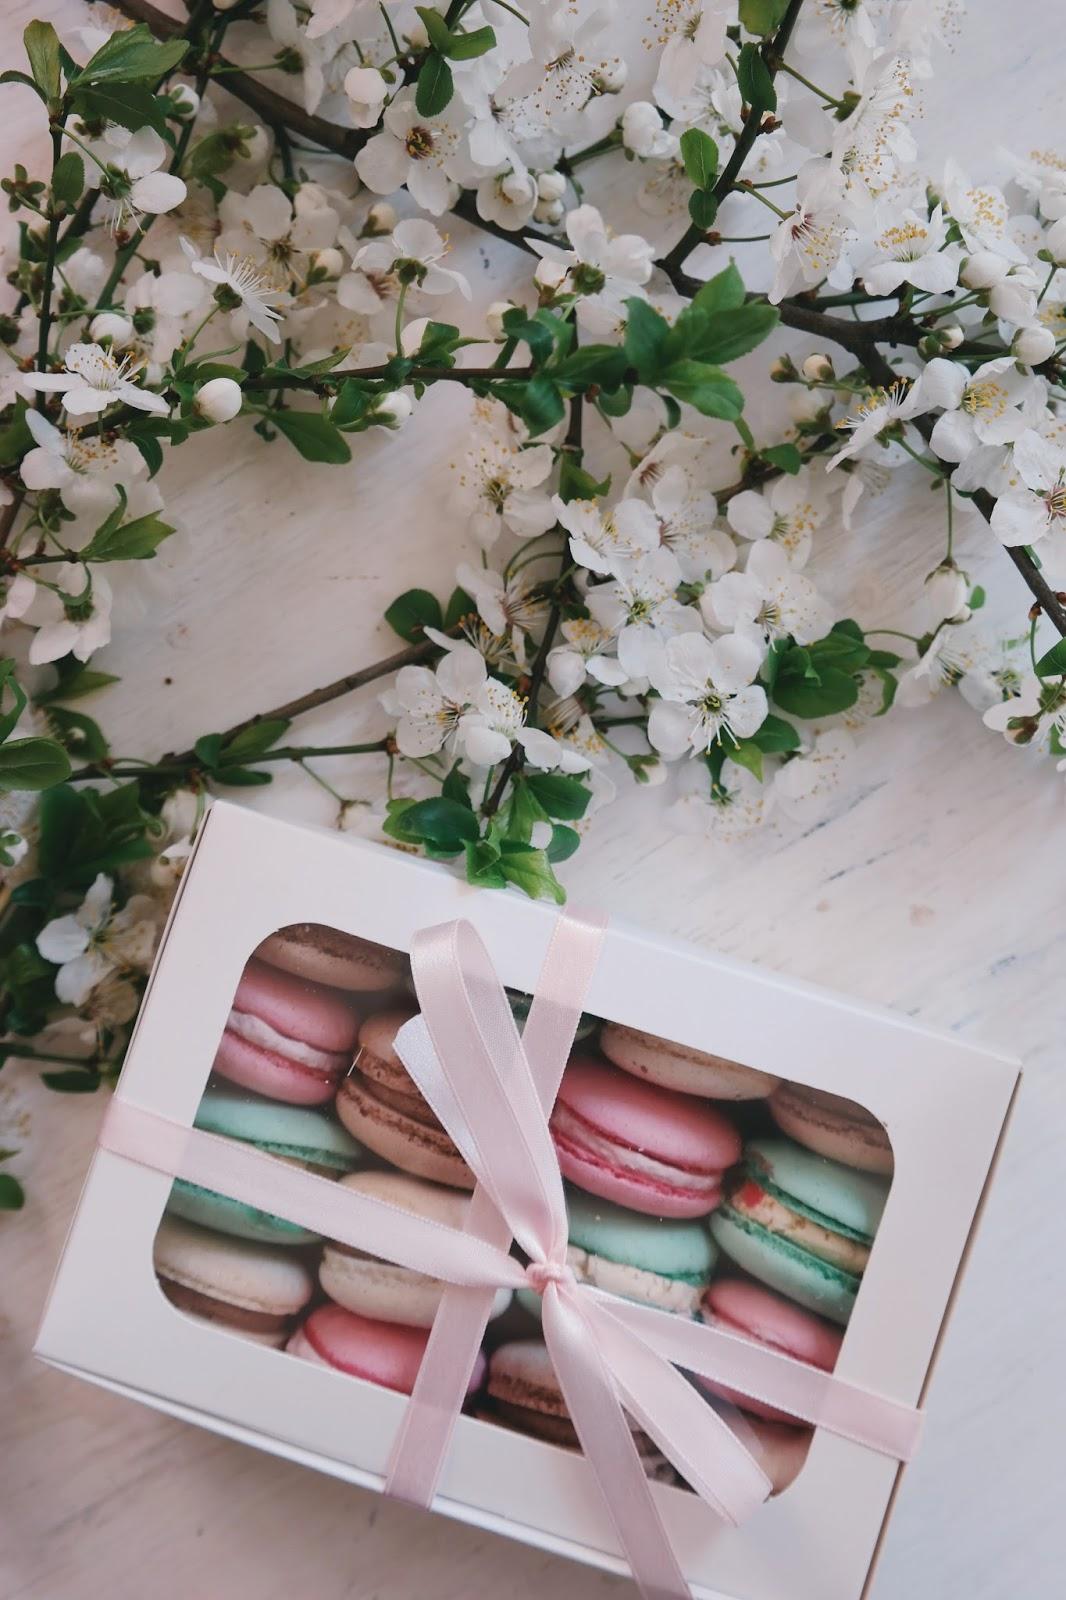 Spring Pastel Coloured Macarons